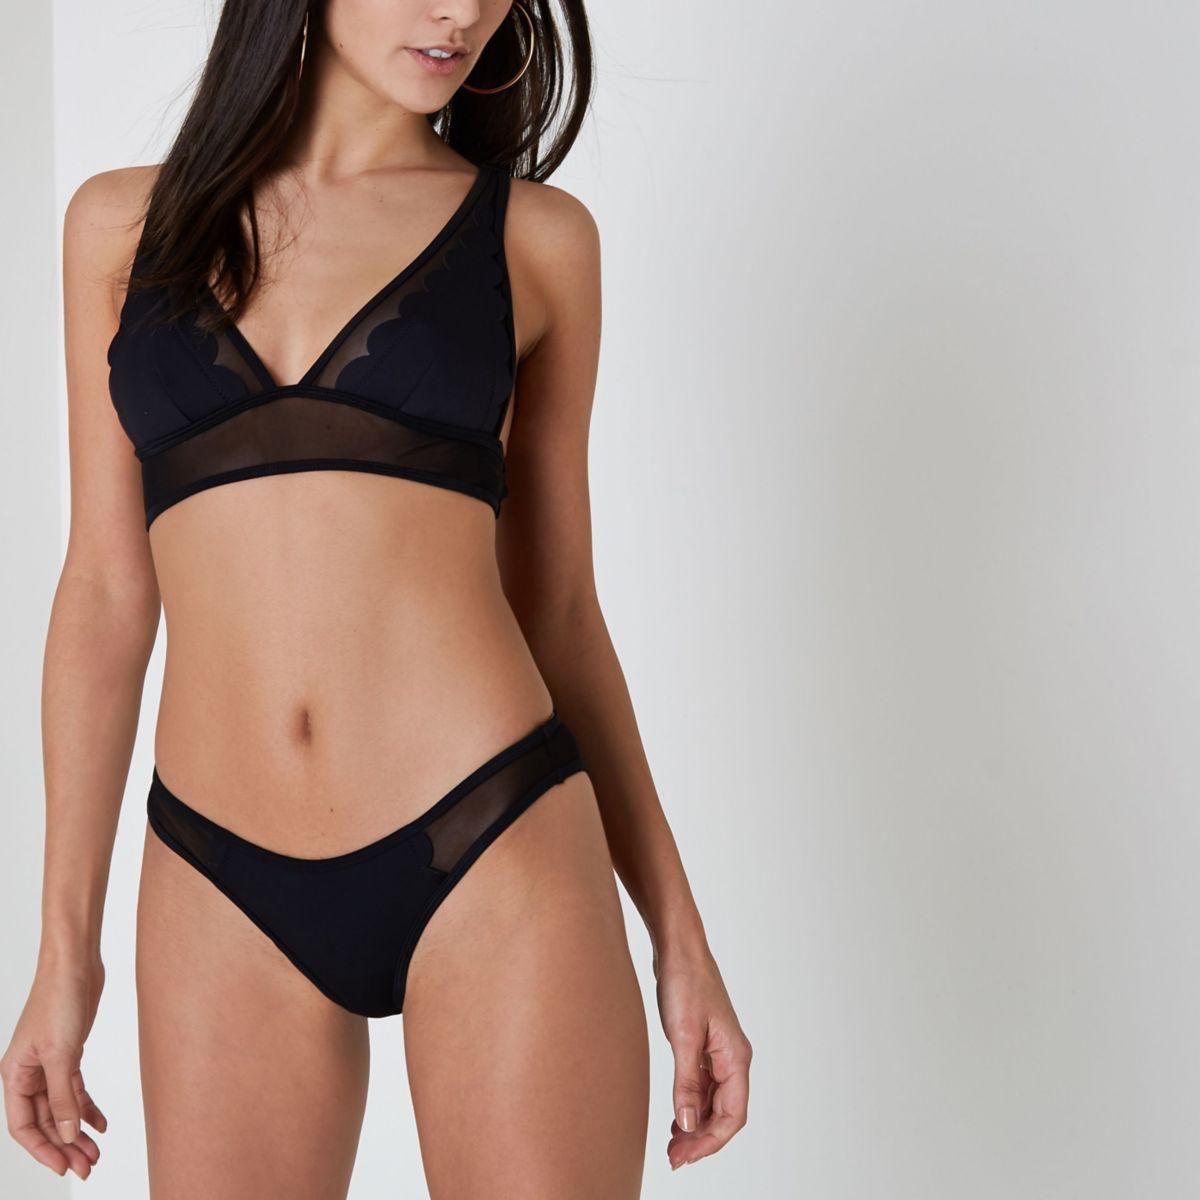 Bas de bikini échancré en néoprène noir festonné